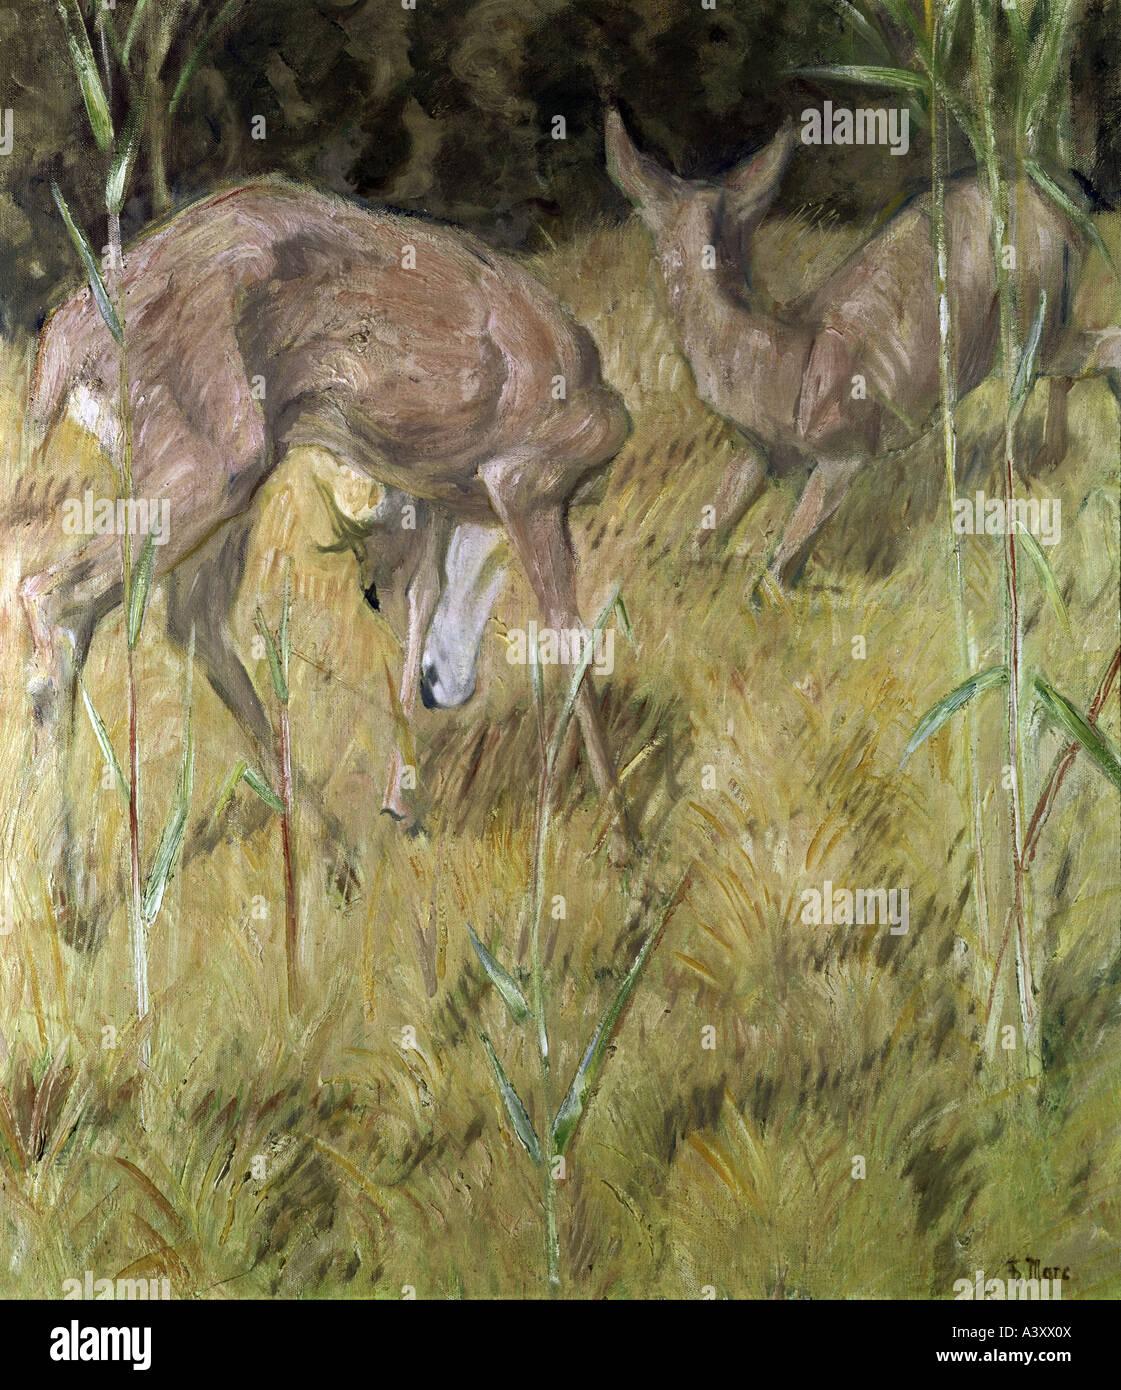 """Belle Arti, Marc Franz, (1880 - 1916), pittura, 'Rehe im Schilf', 'deers nel pettine"", 1909, olio su tela, 88,5 cm x 78,5 Foto Stock"